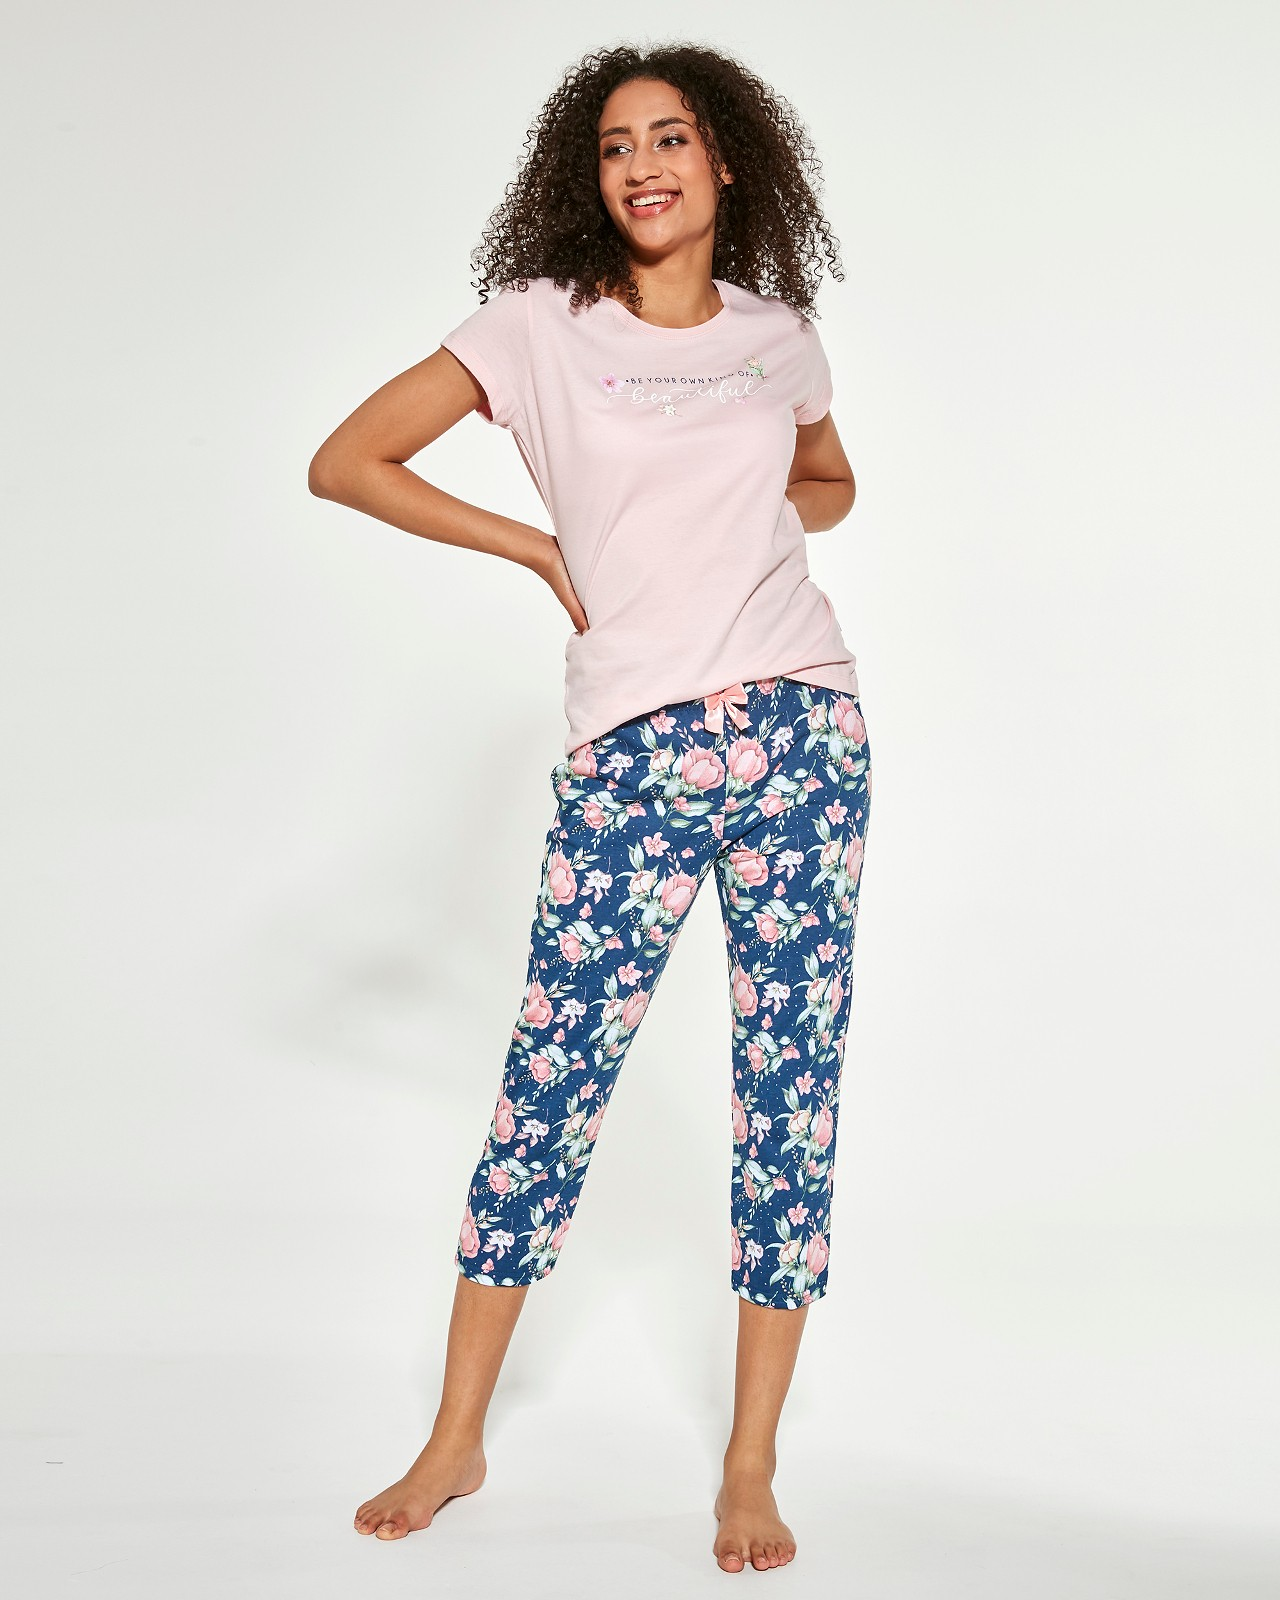 Trojdielne dámske pyžamo Cornette 466/281 Beautiful kr / r ružový M